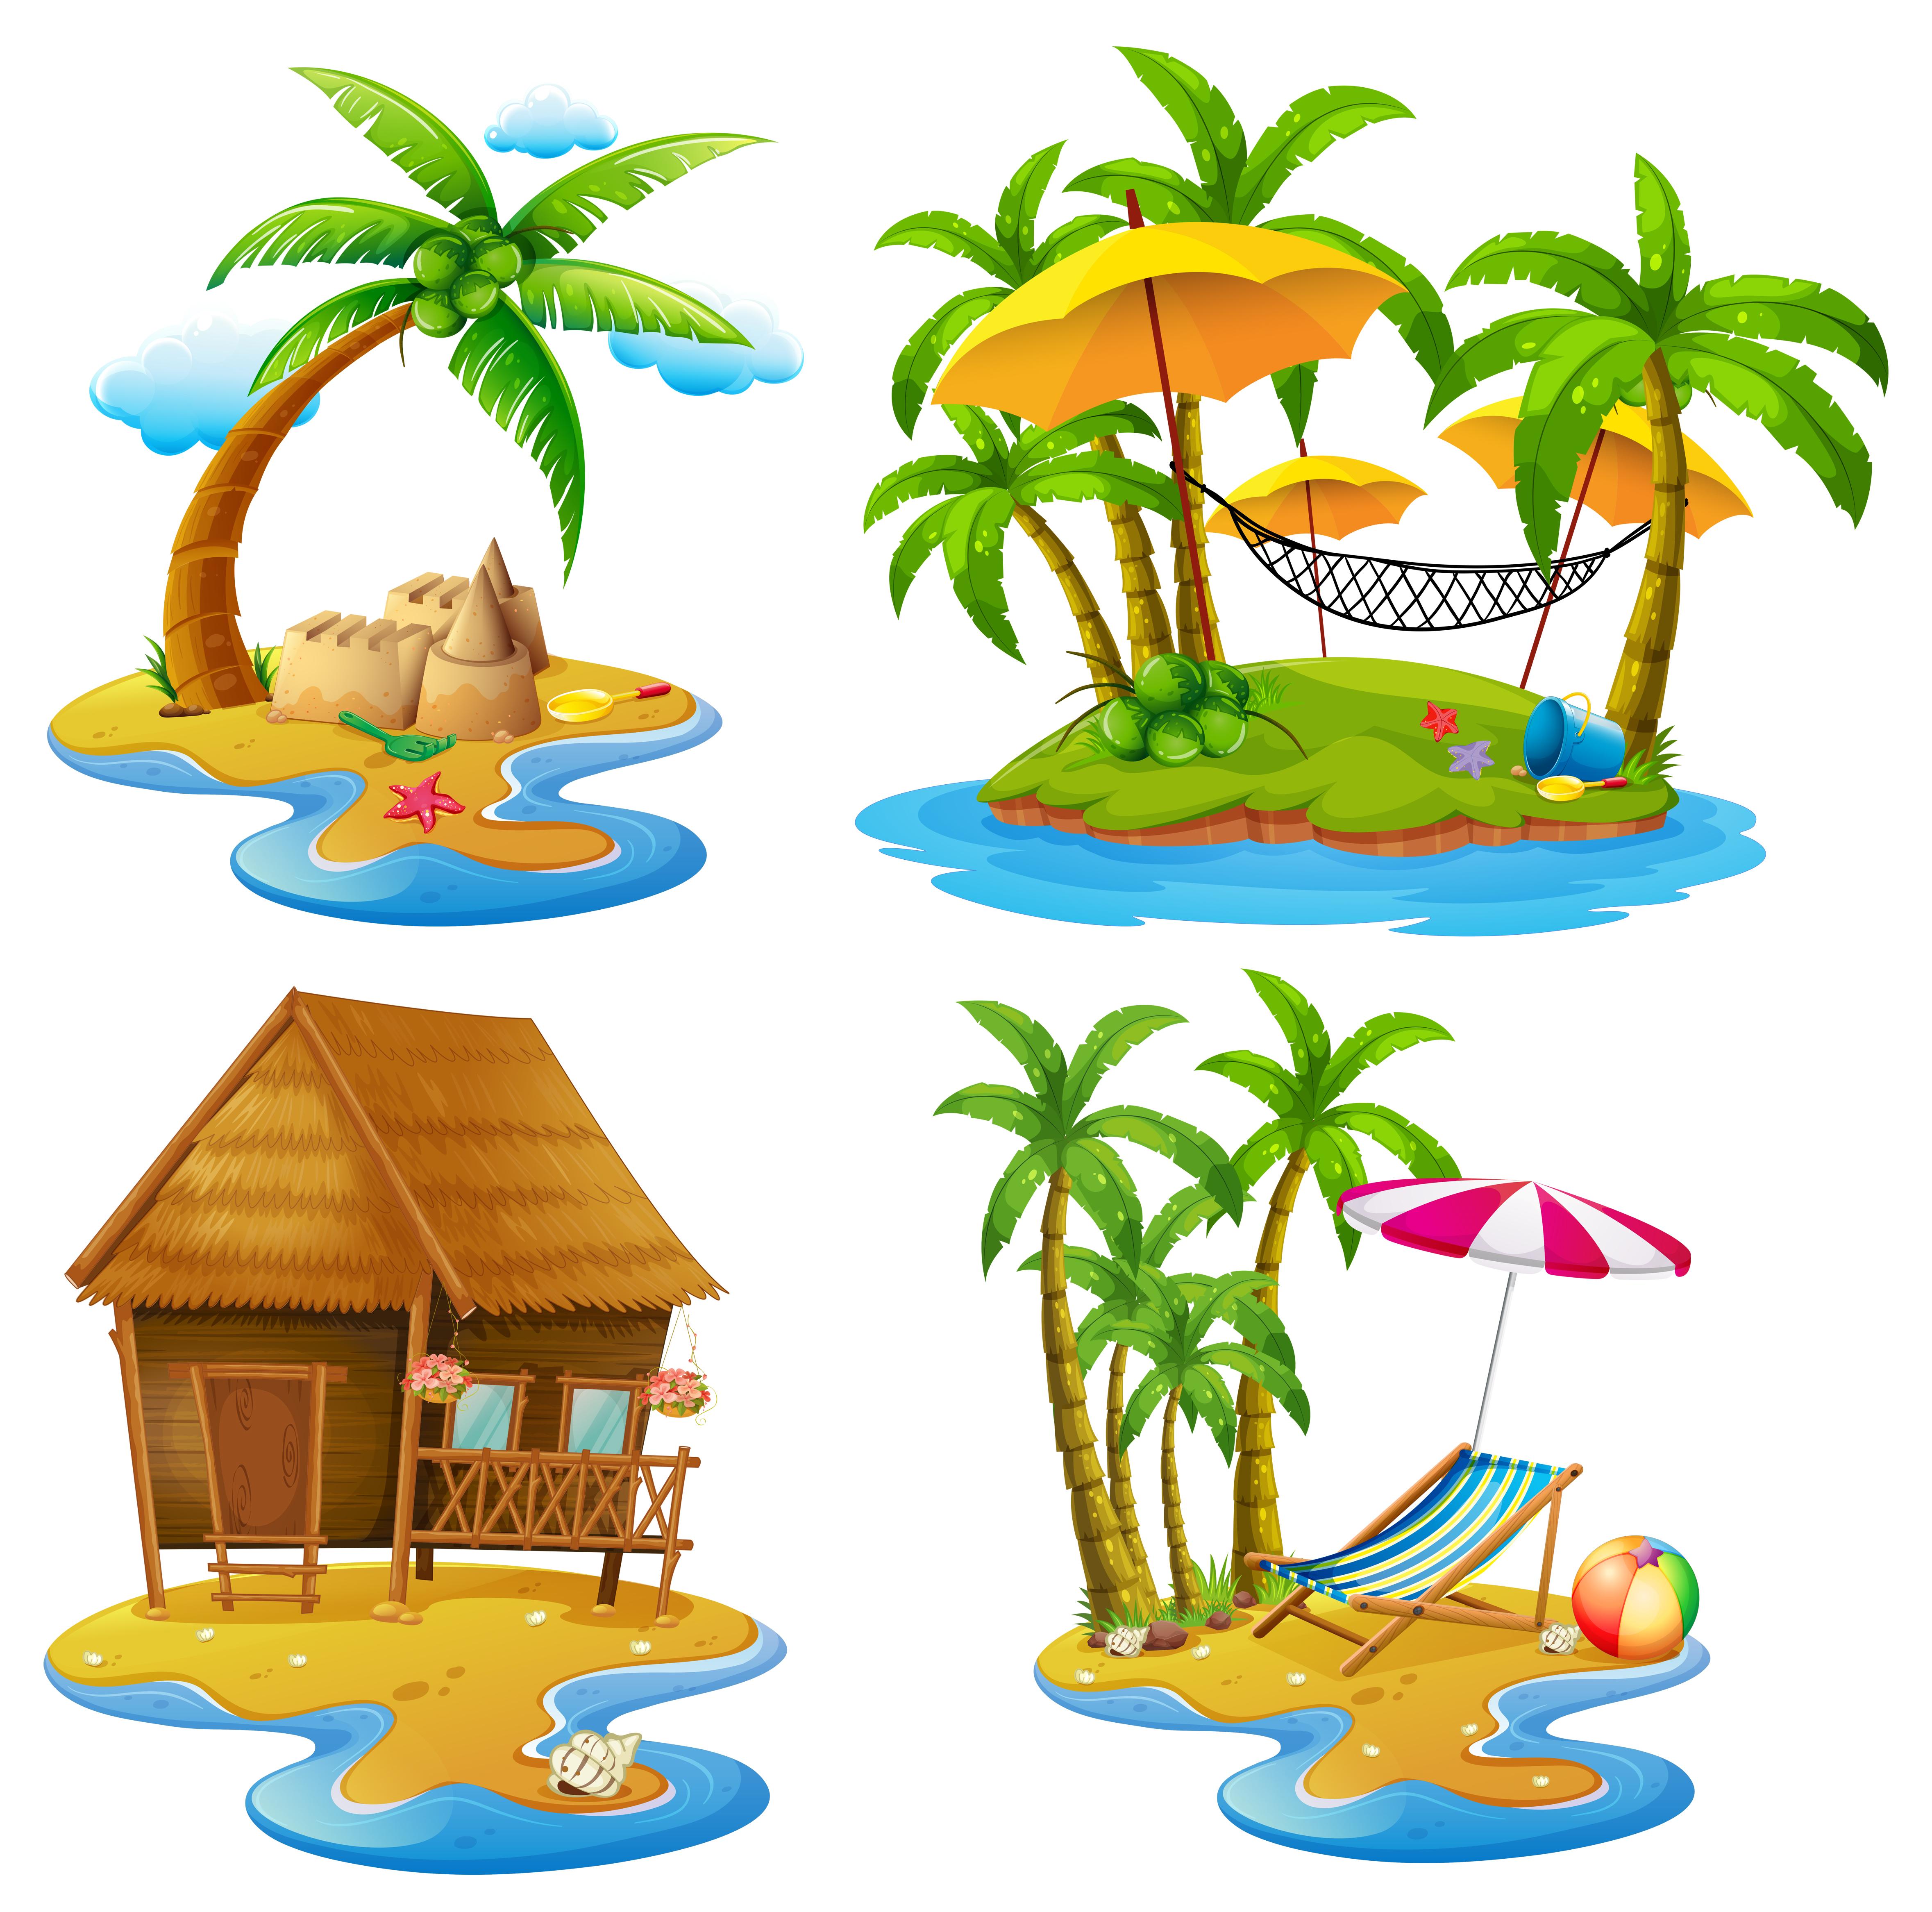 Island Beach Scenes: Four Scenes Of Islands And Sea